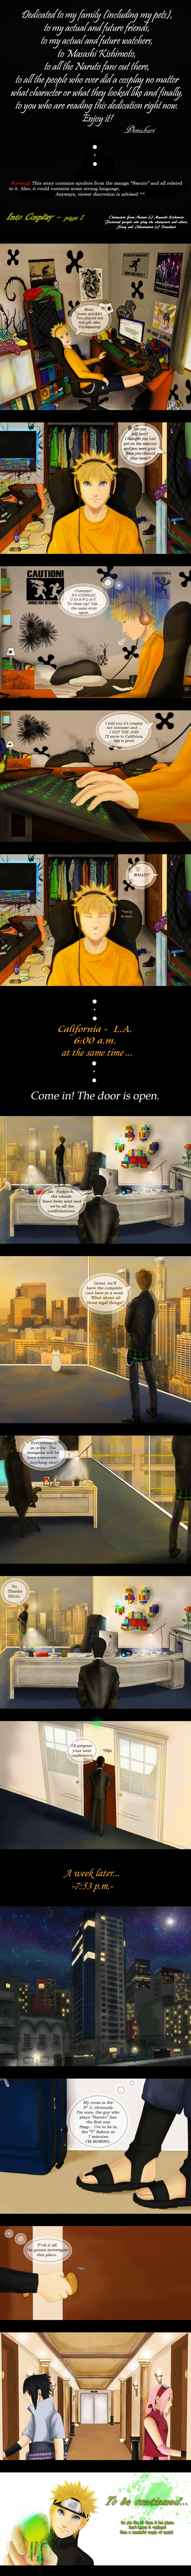 Into Cosplay - Page 1 by Denakari